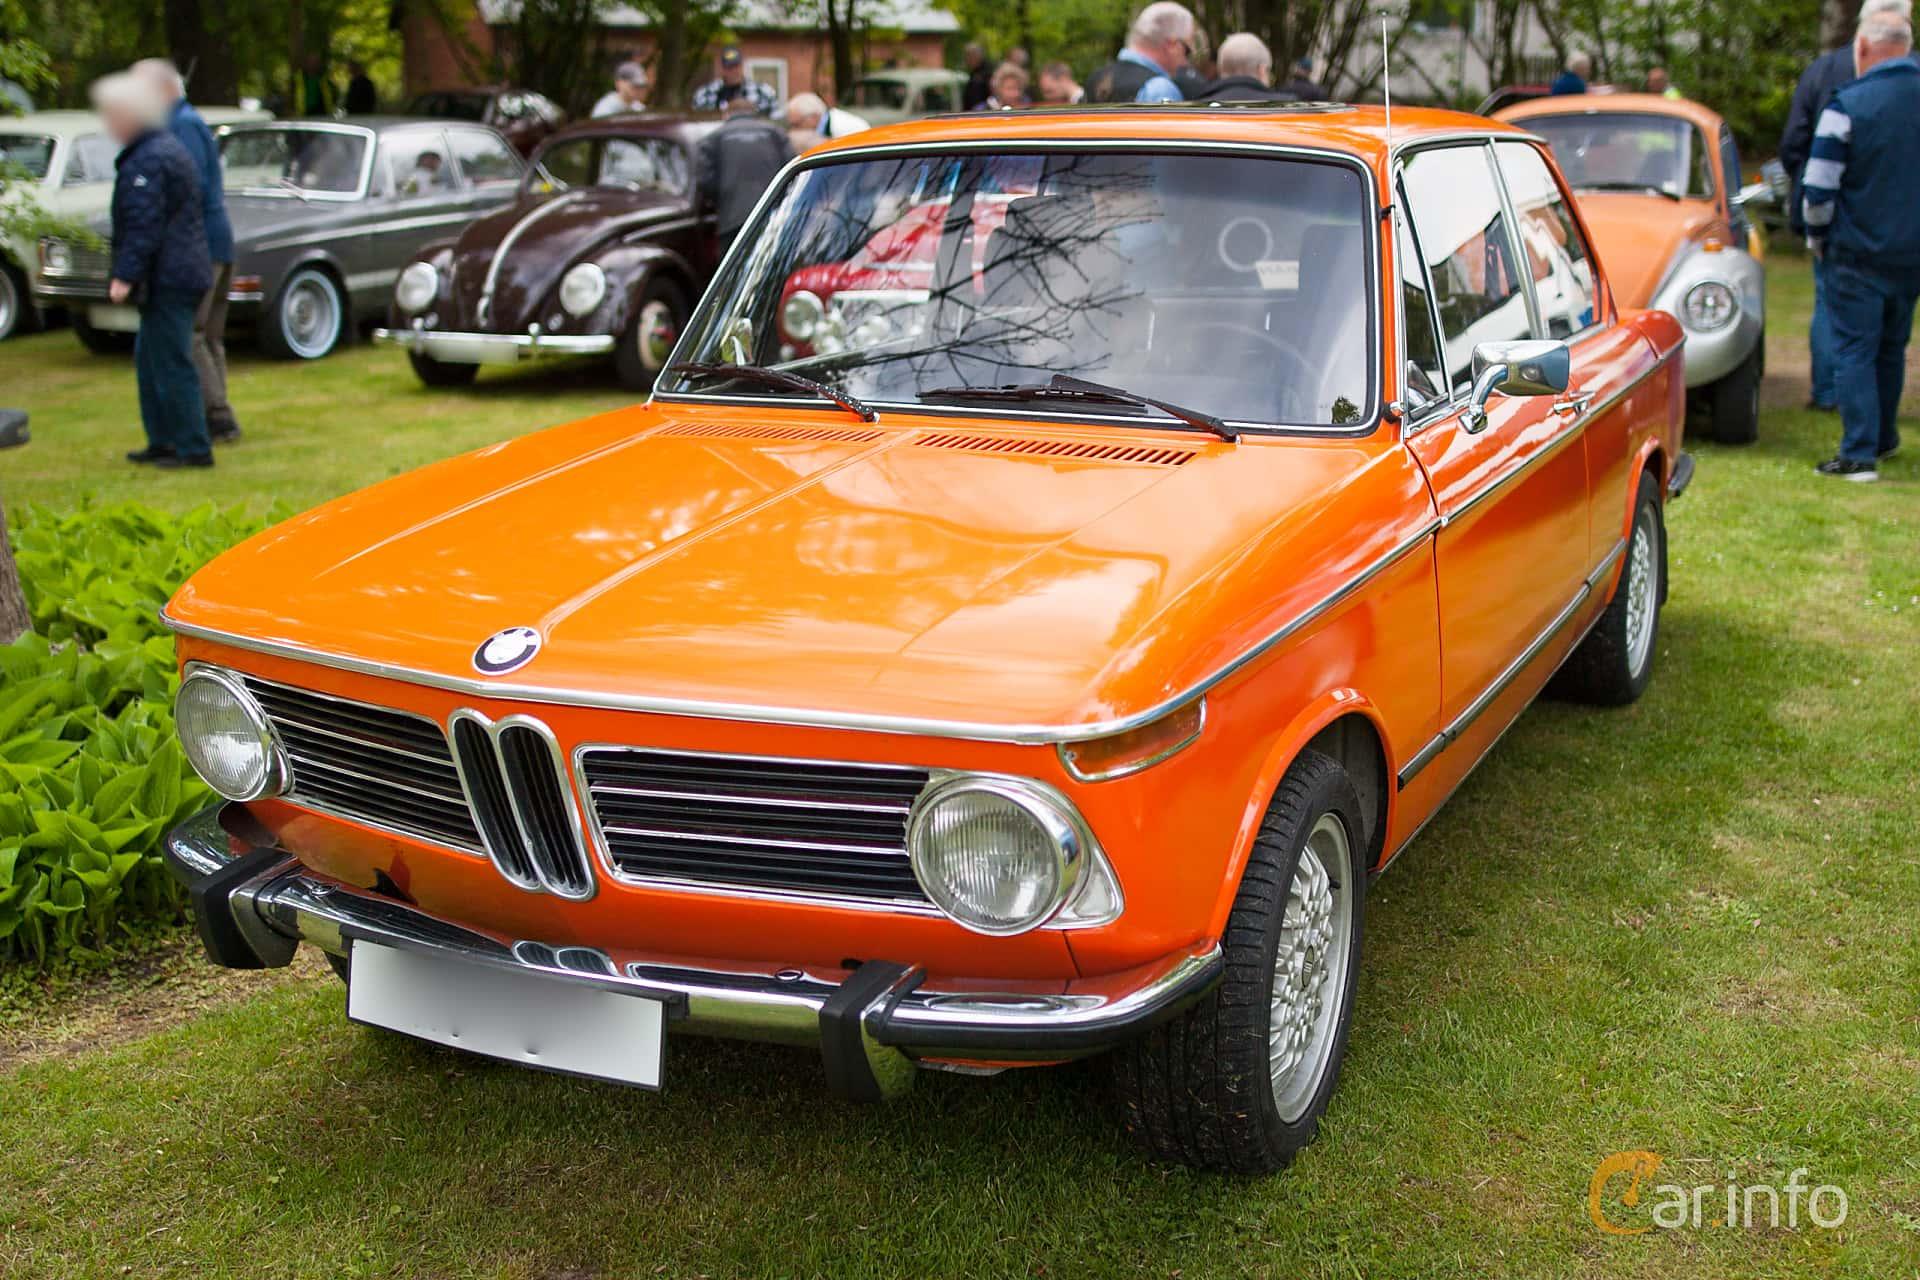 BMW 2002 tii 2-door  Manual, 130hp, 1973 at Billesholms Veteranbilsträff Maj / 2015